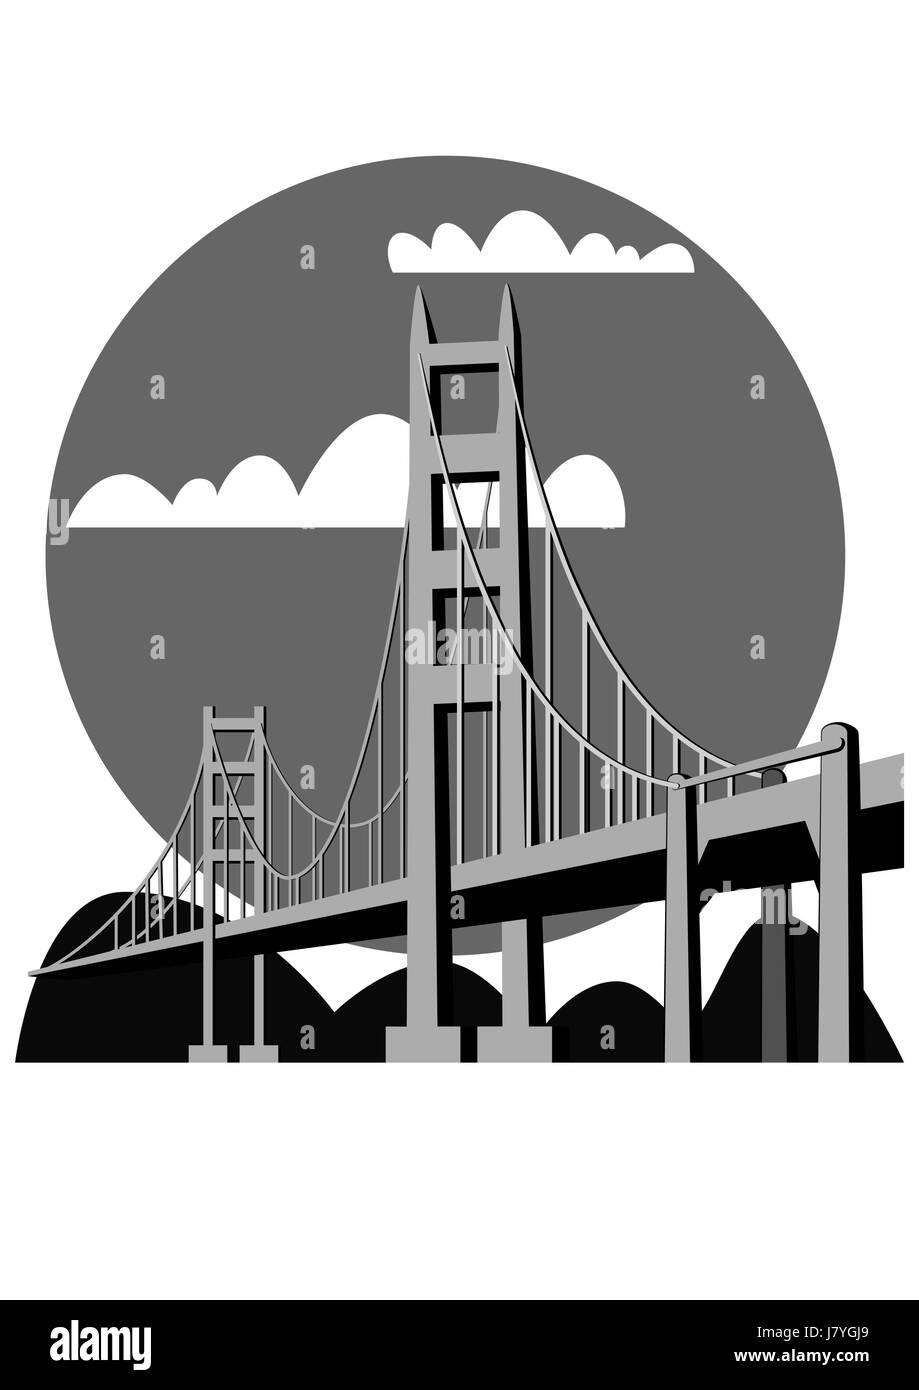 travel famous bridge tourism landmark logo travel city town monument model - Stock Image